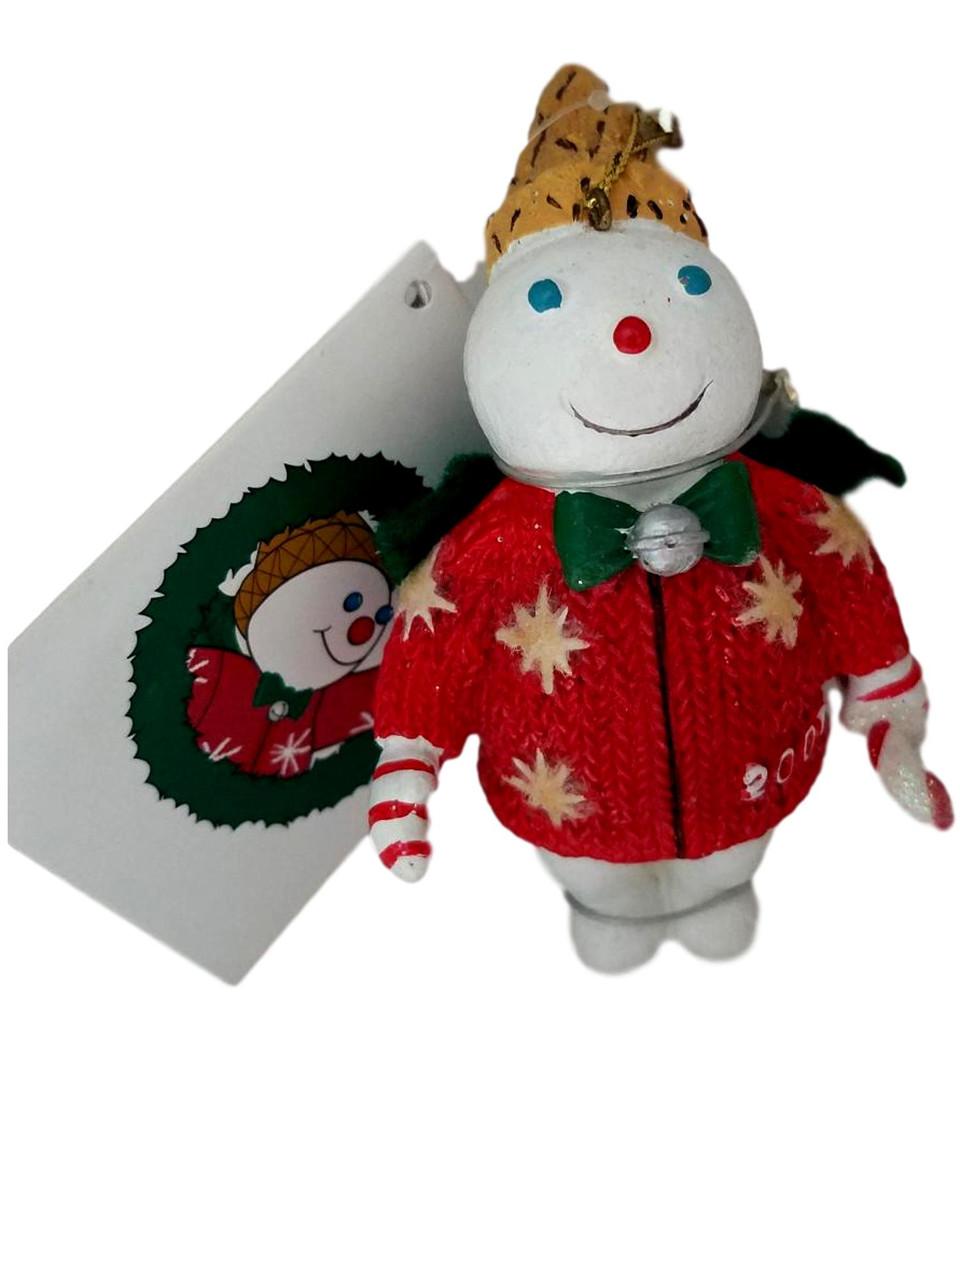 Mr Bingle 2007 Christmas Ornament Dillards New In Box